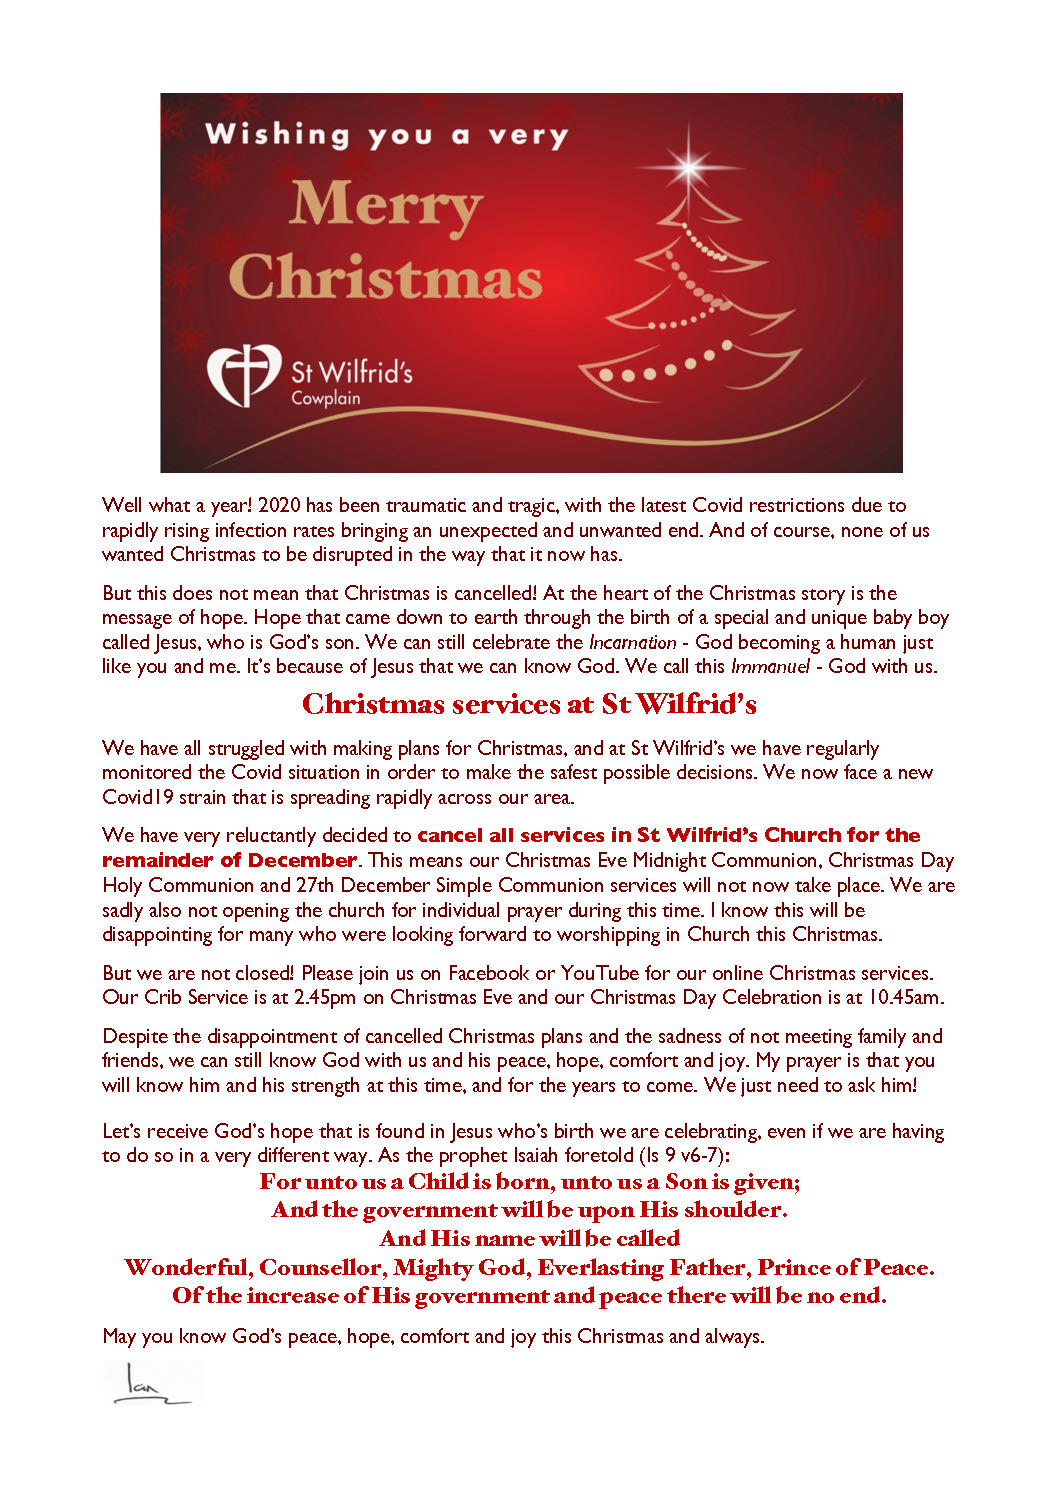 thumbnail of Christmas message 2020